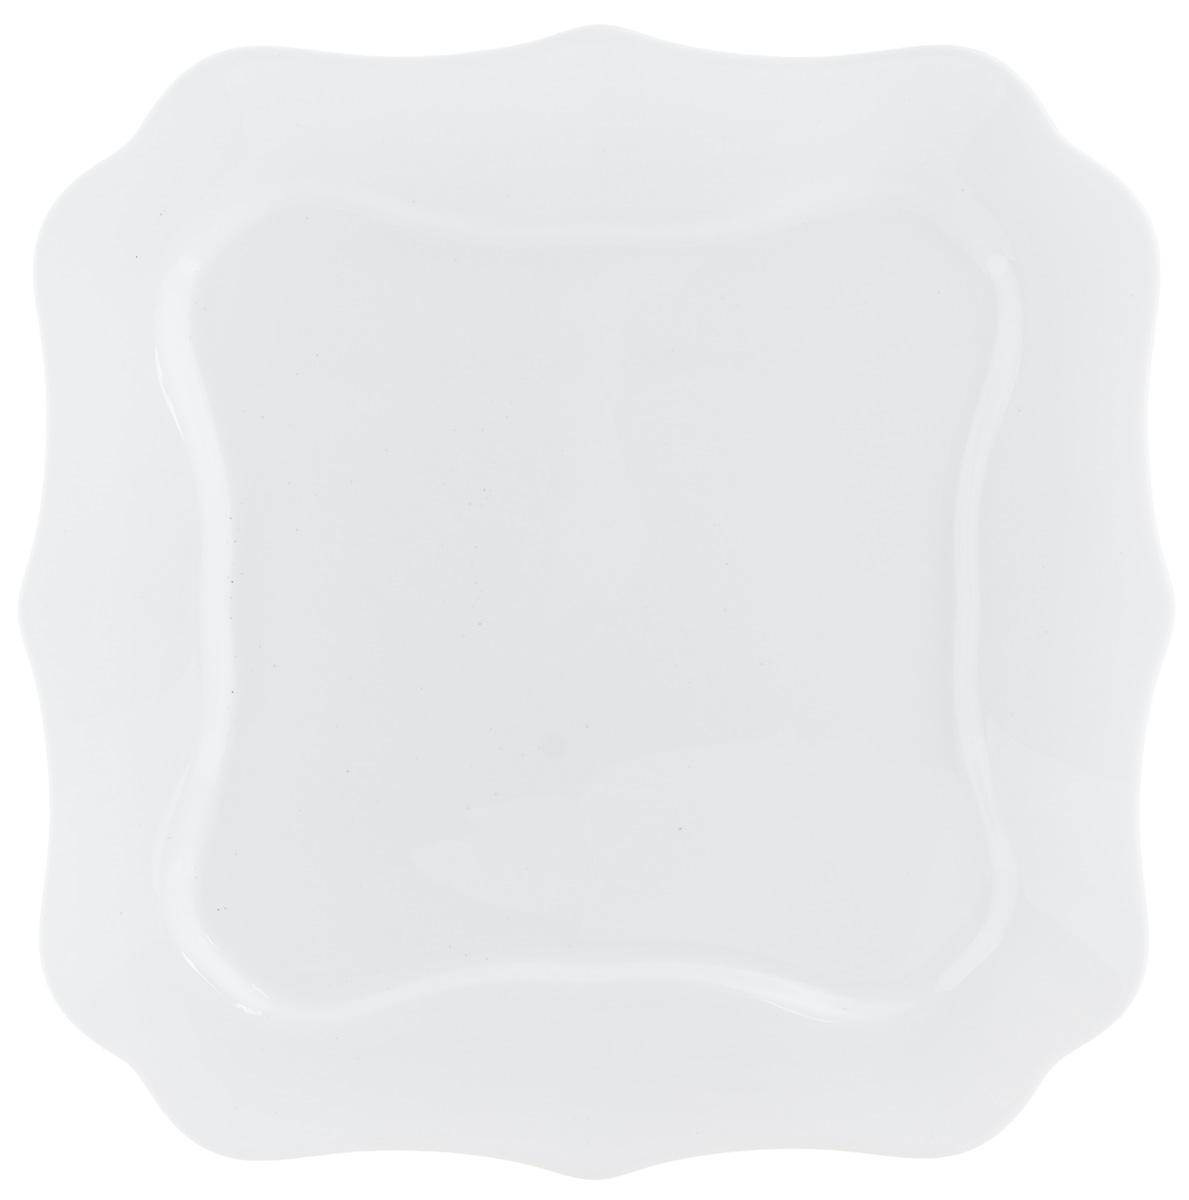 Тарелка обеденная Luminarc, 26 х 26 см тарелка обеденная smeraldo festival d27 см